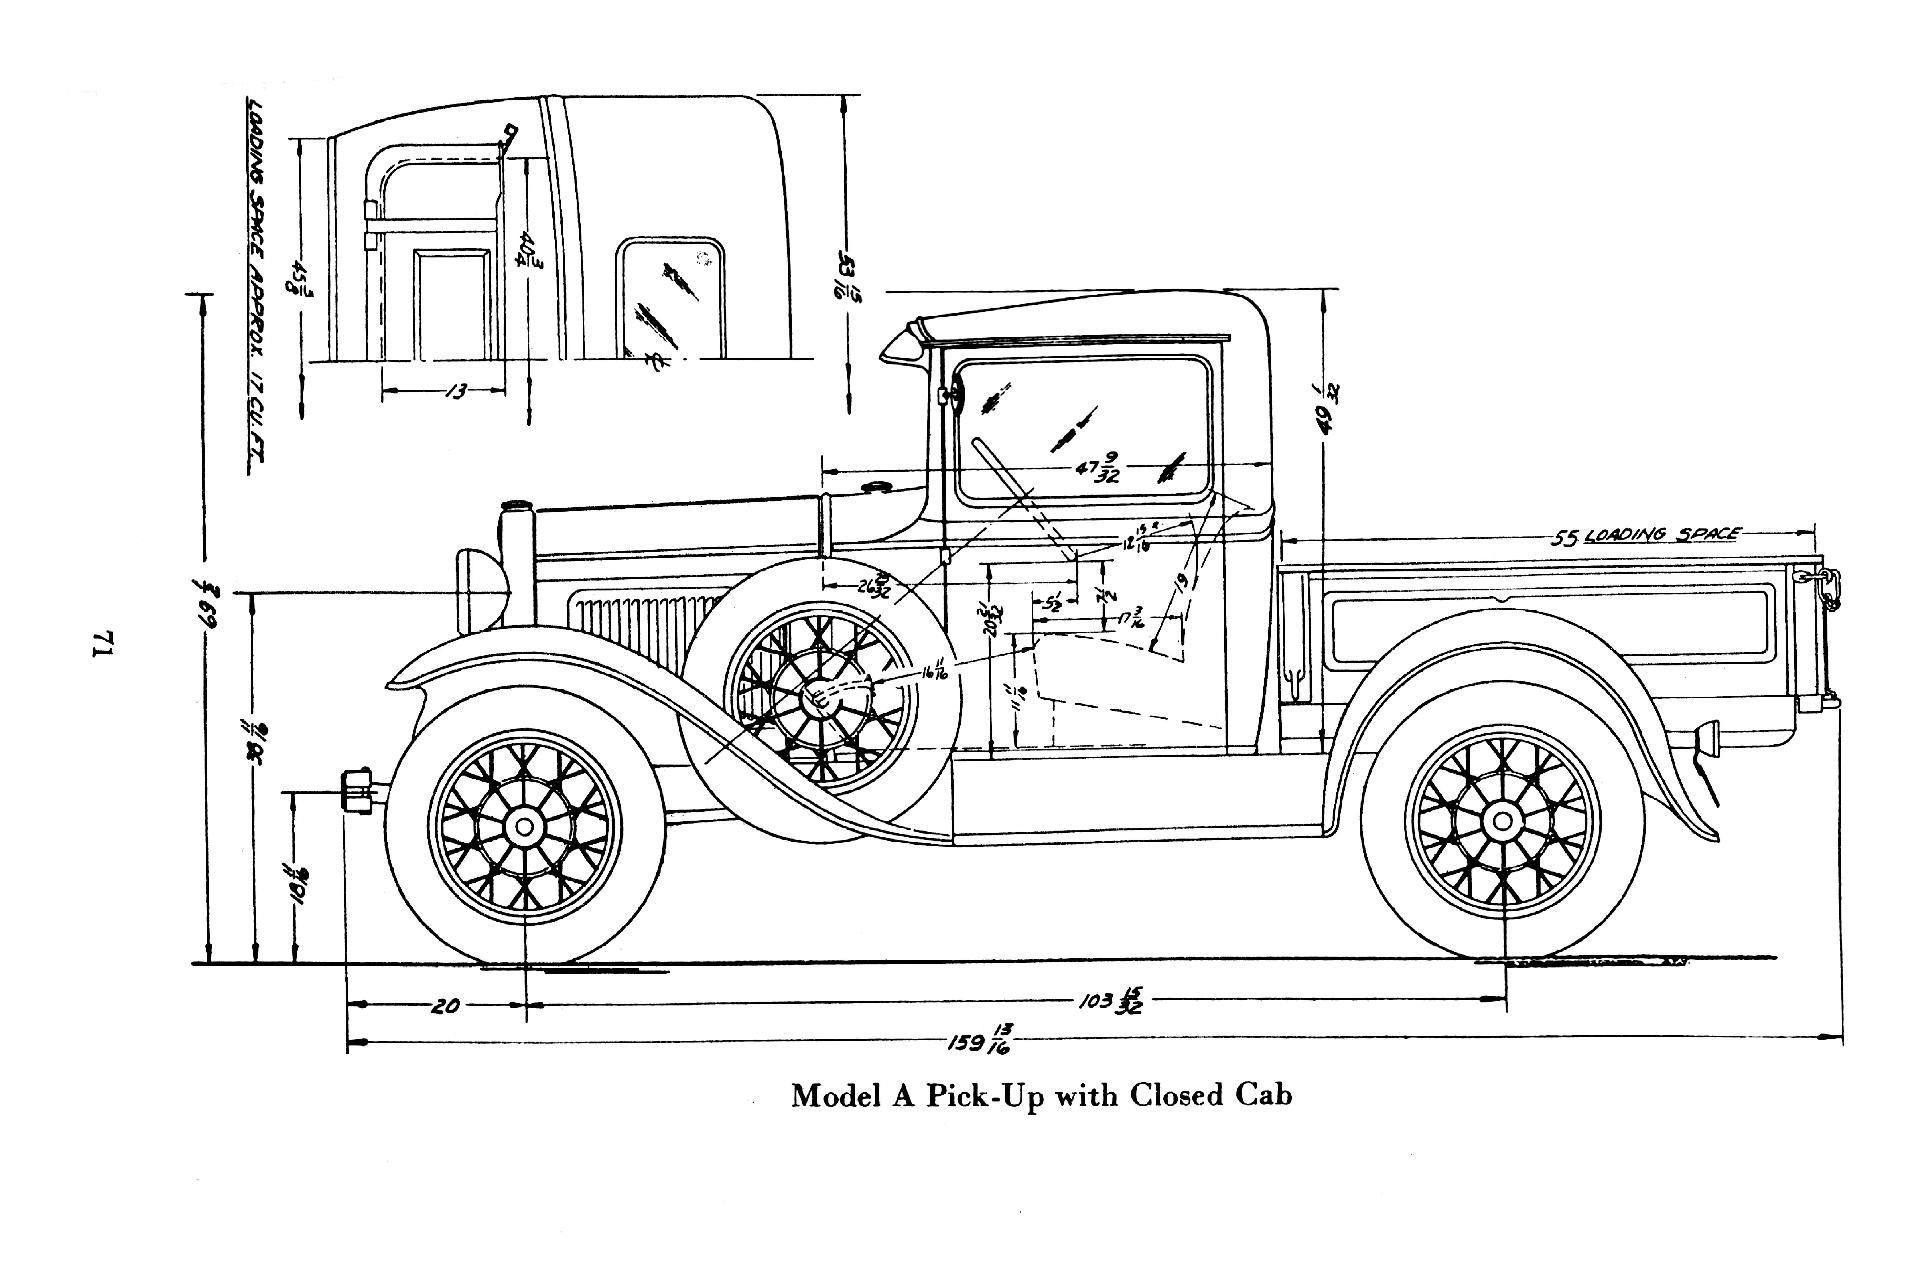 1929 Ford Model Cab Dimensions